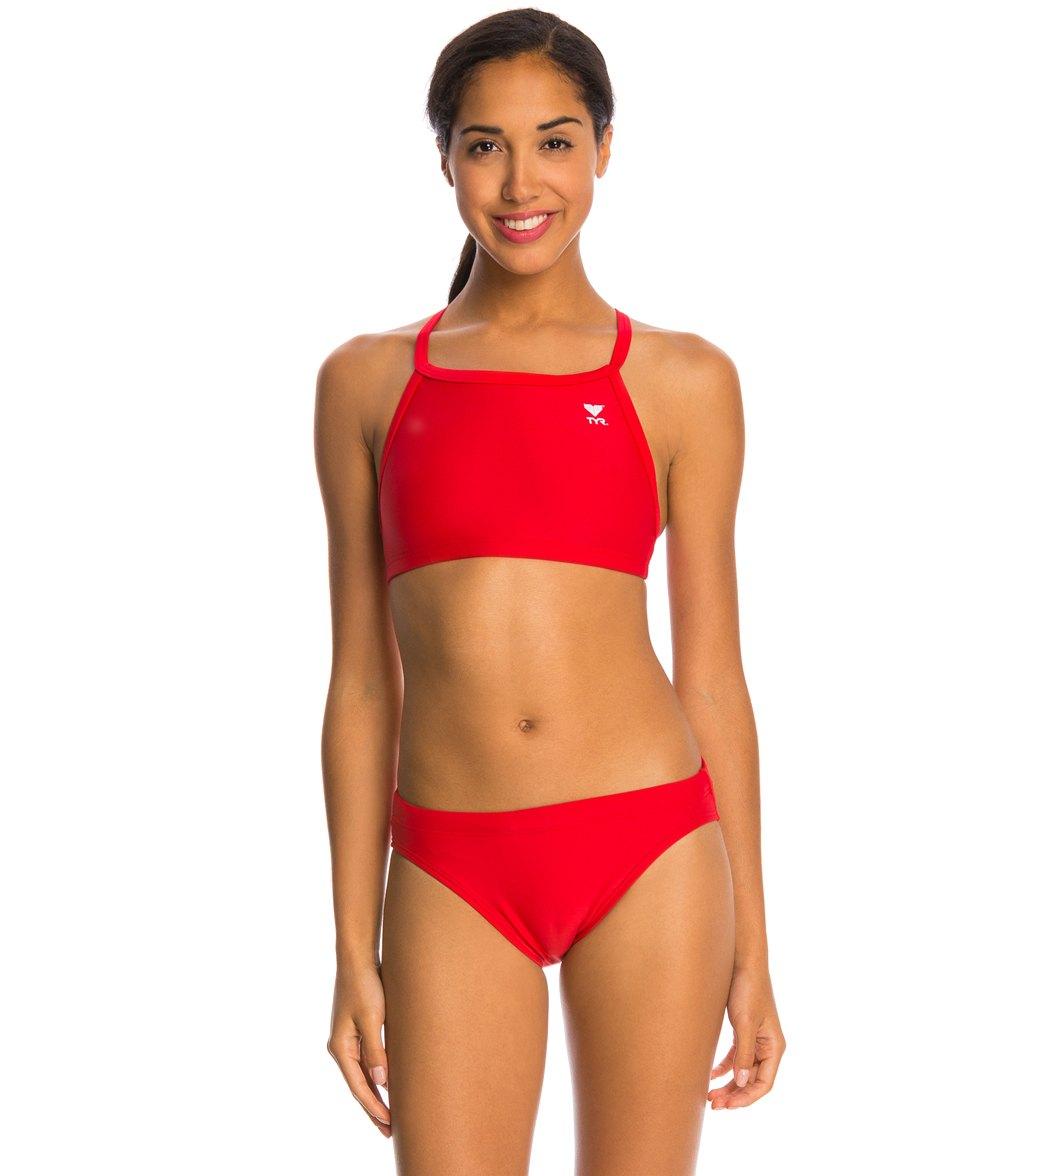 c040e9ab91 TYR TYRECO Solid Diamondfit Workout Bikini Swimsuit Set at SwimOutlet.com - Free  Shipping